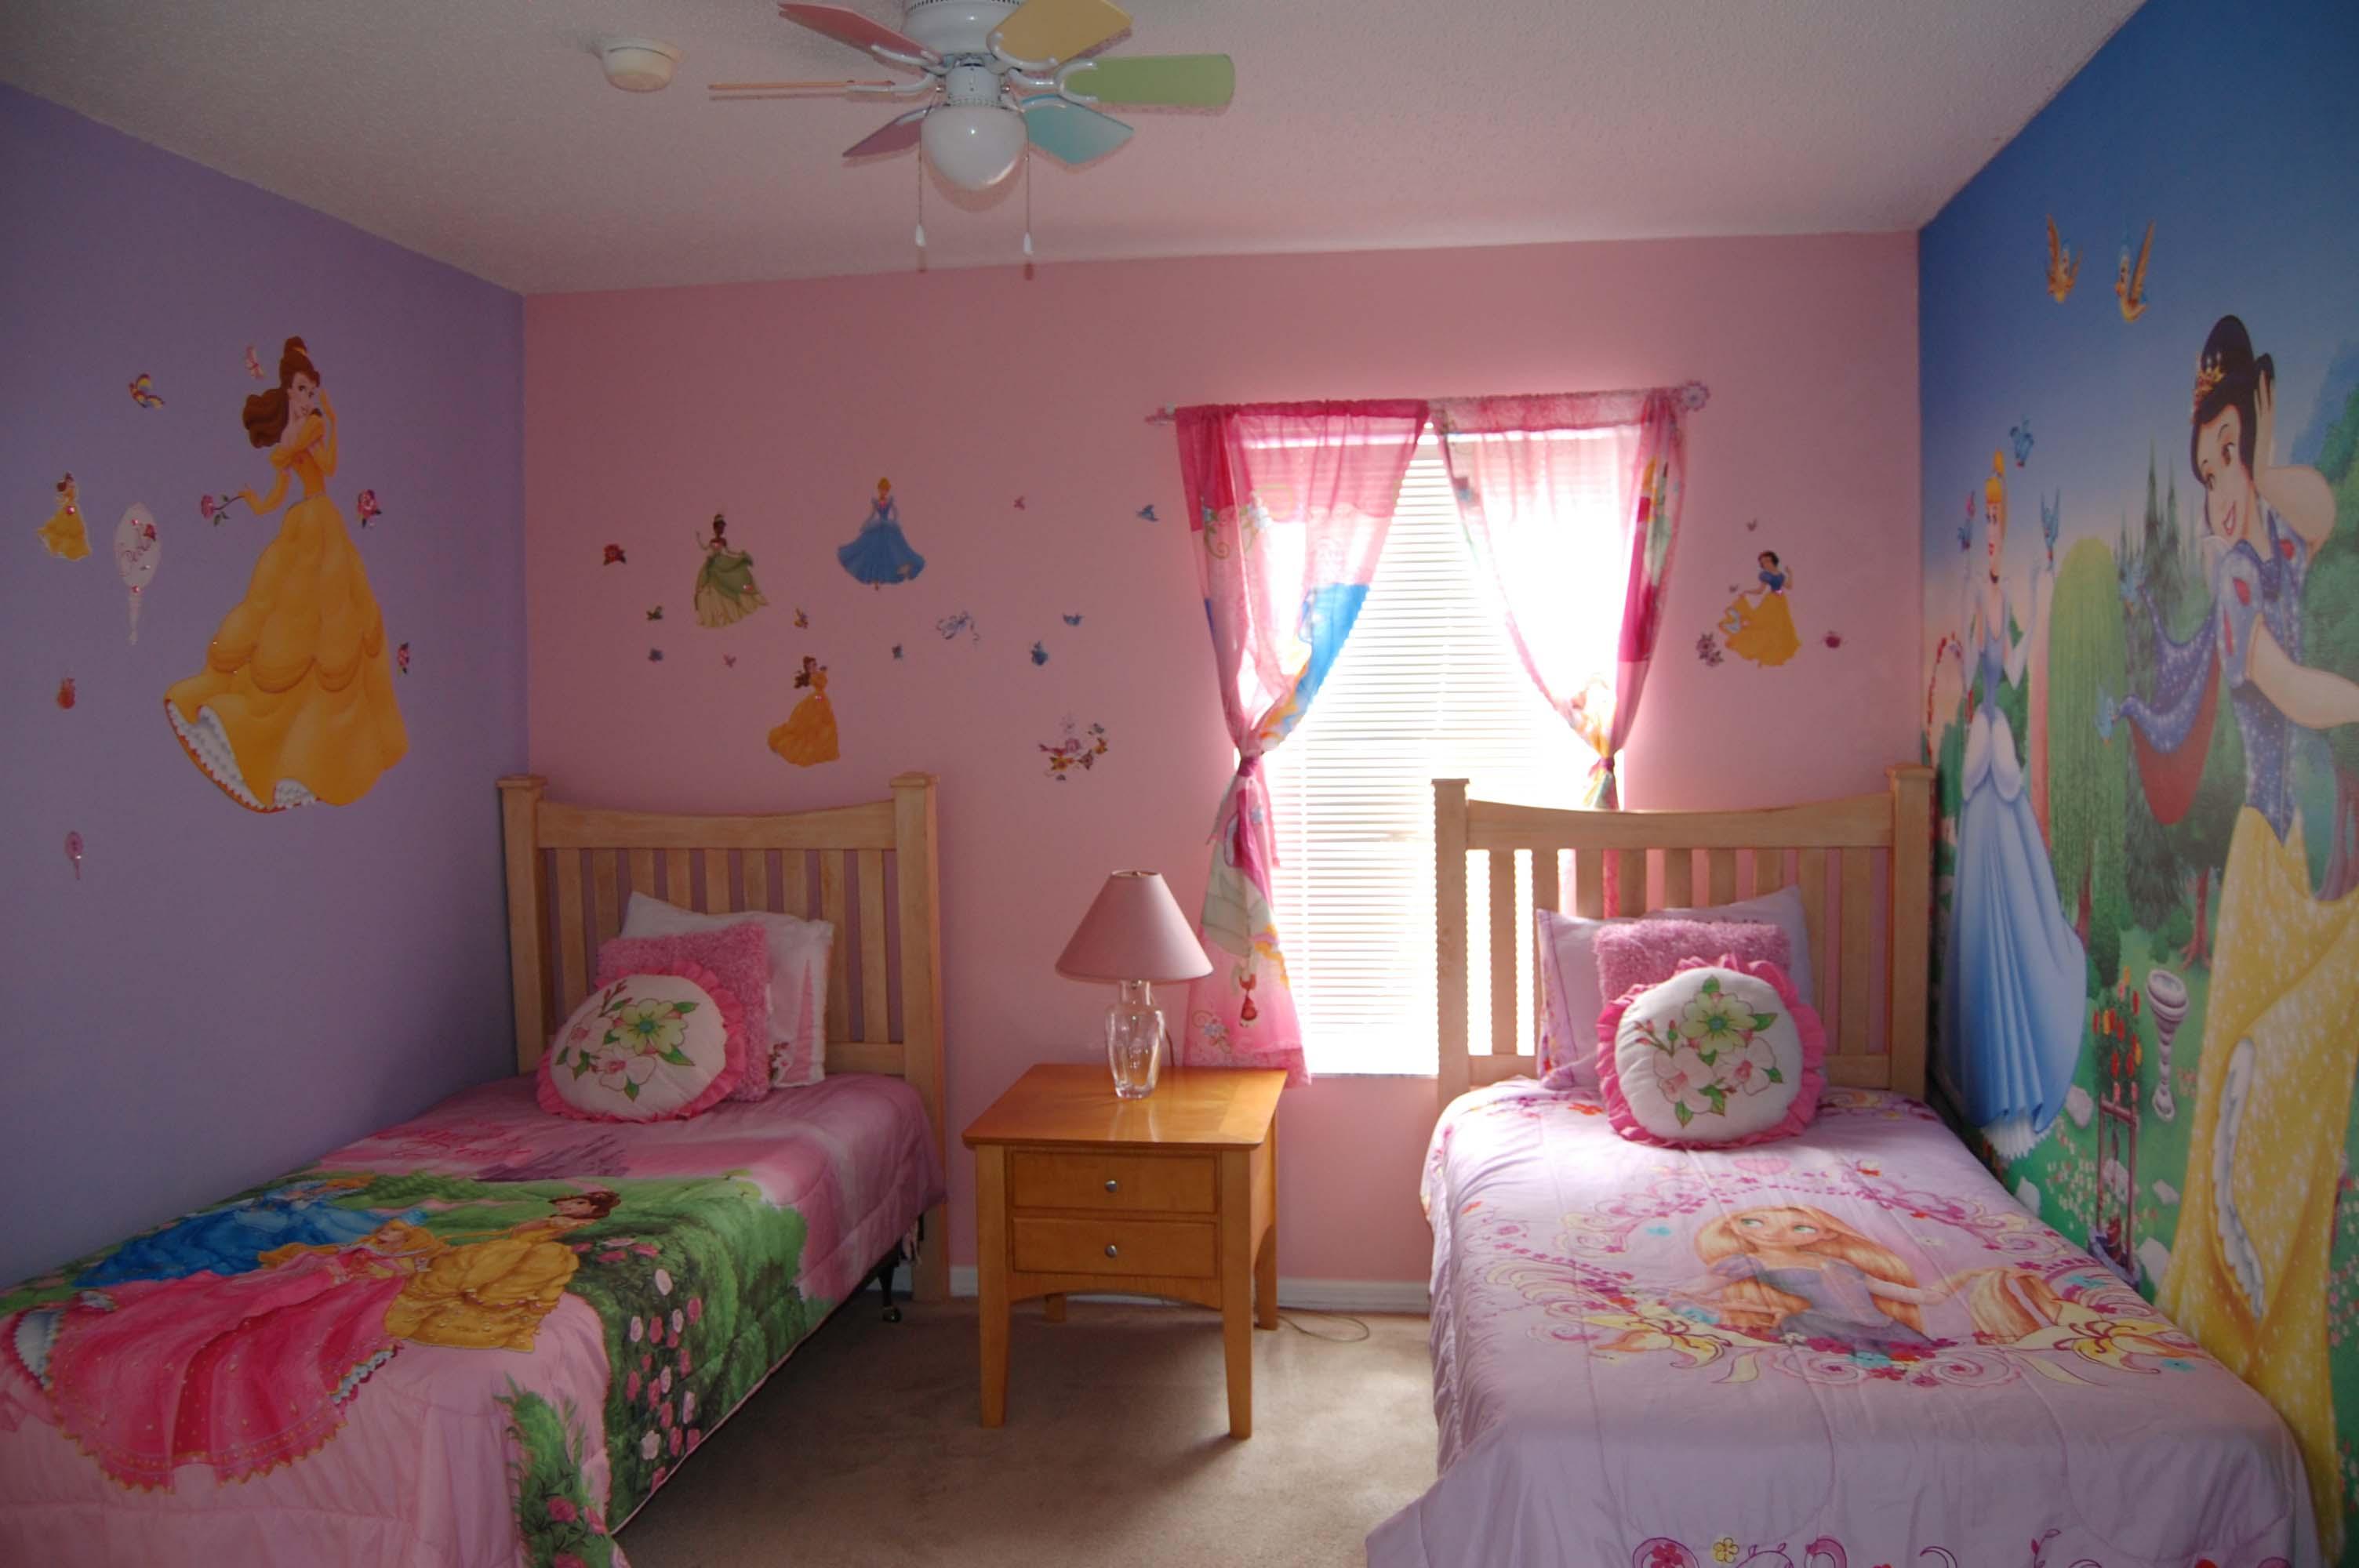 Upstair Girl's Room